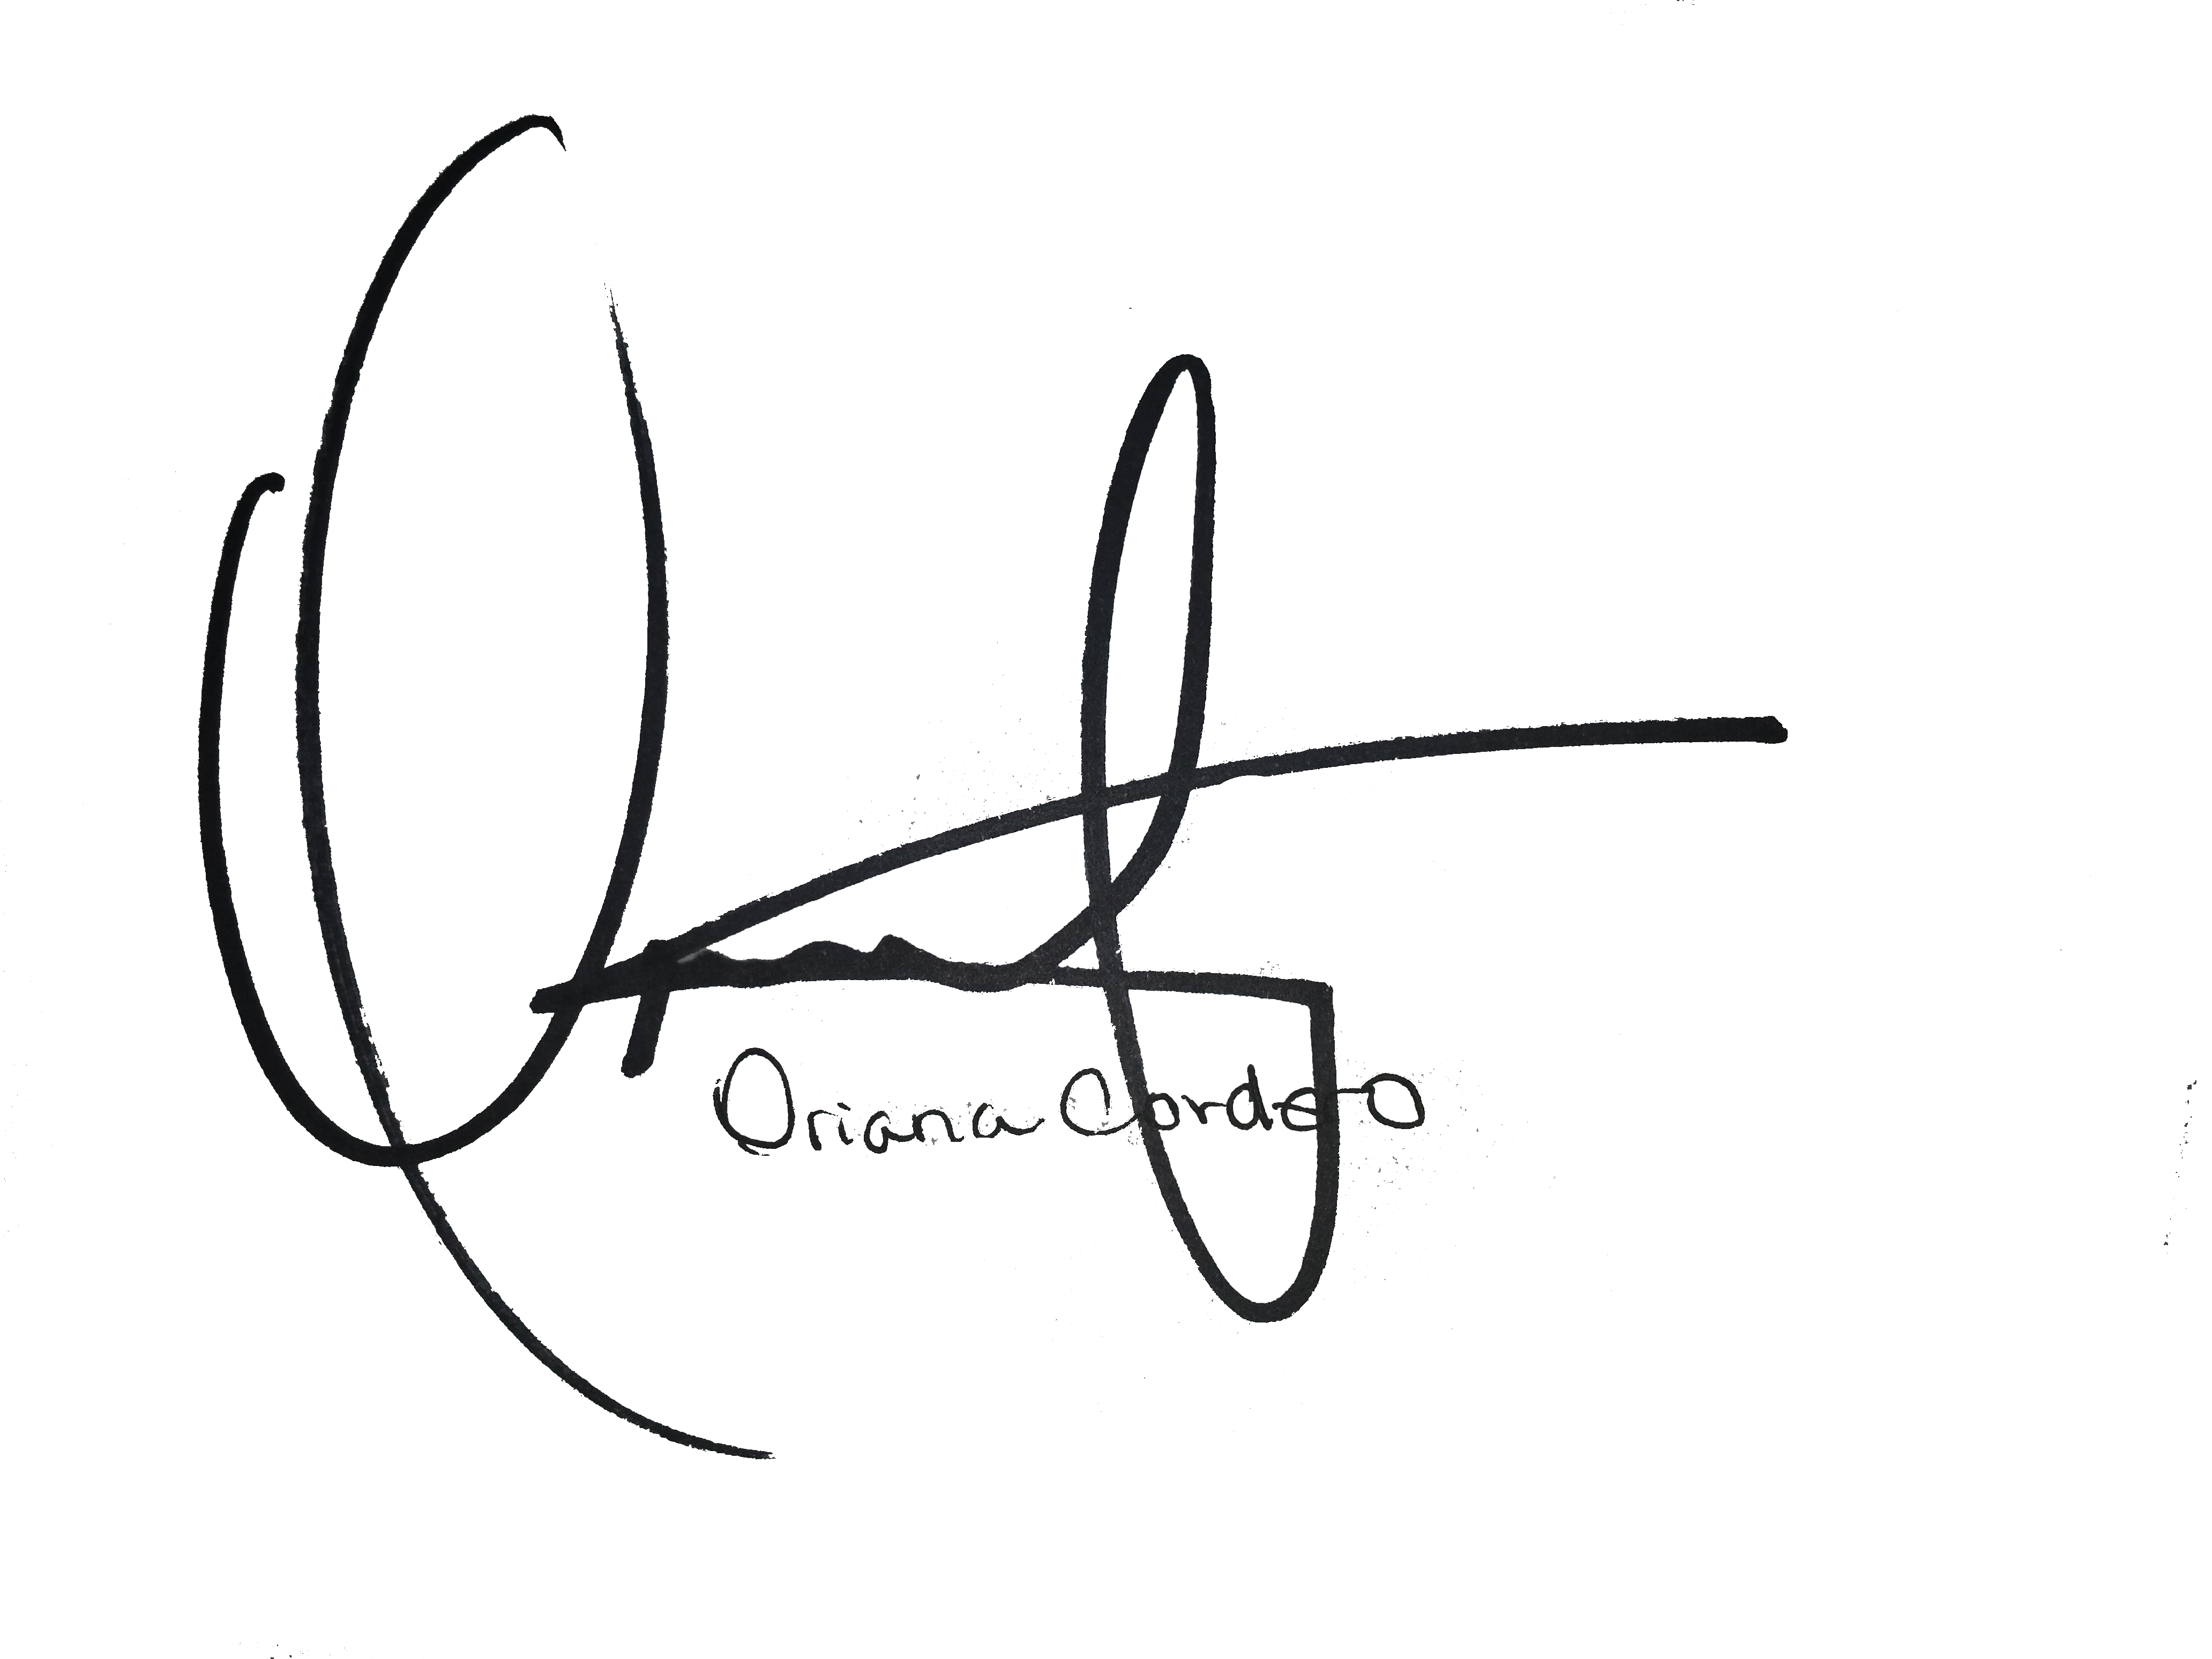 Oriana Cordero's Signature